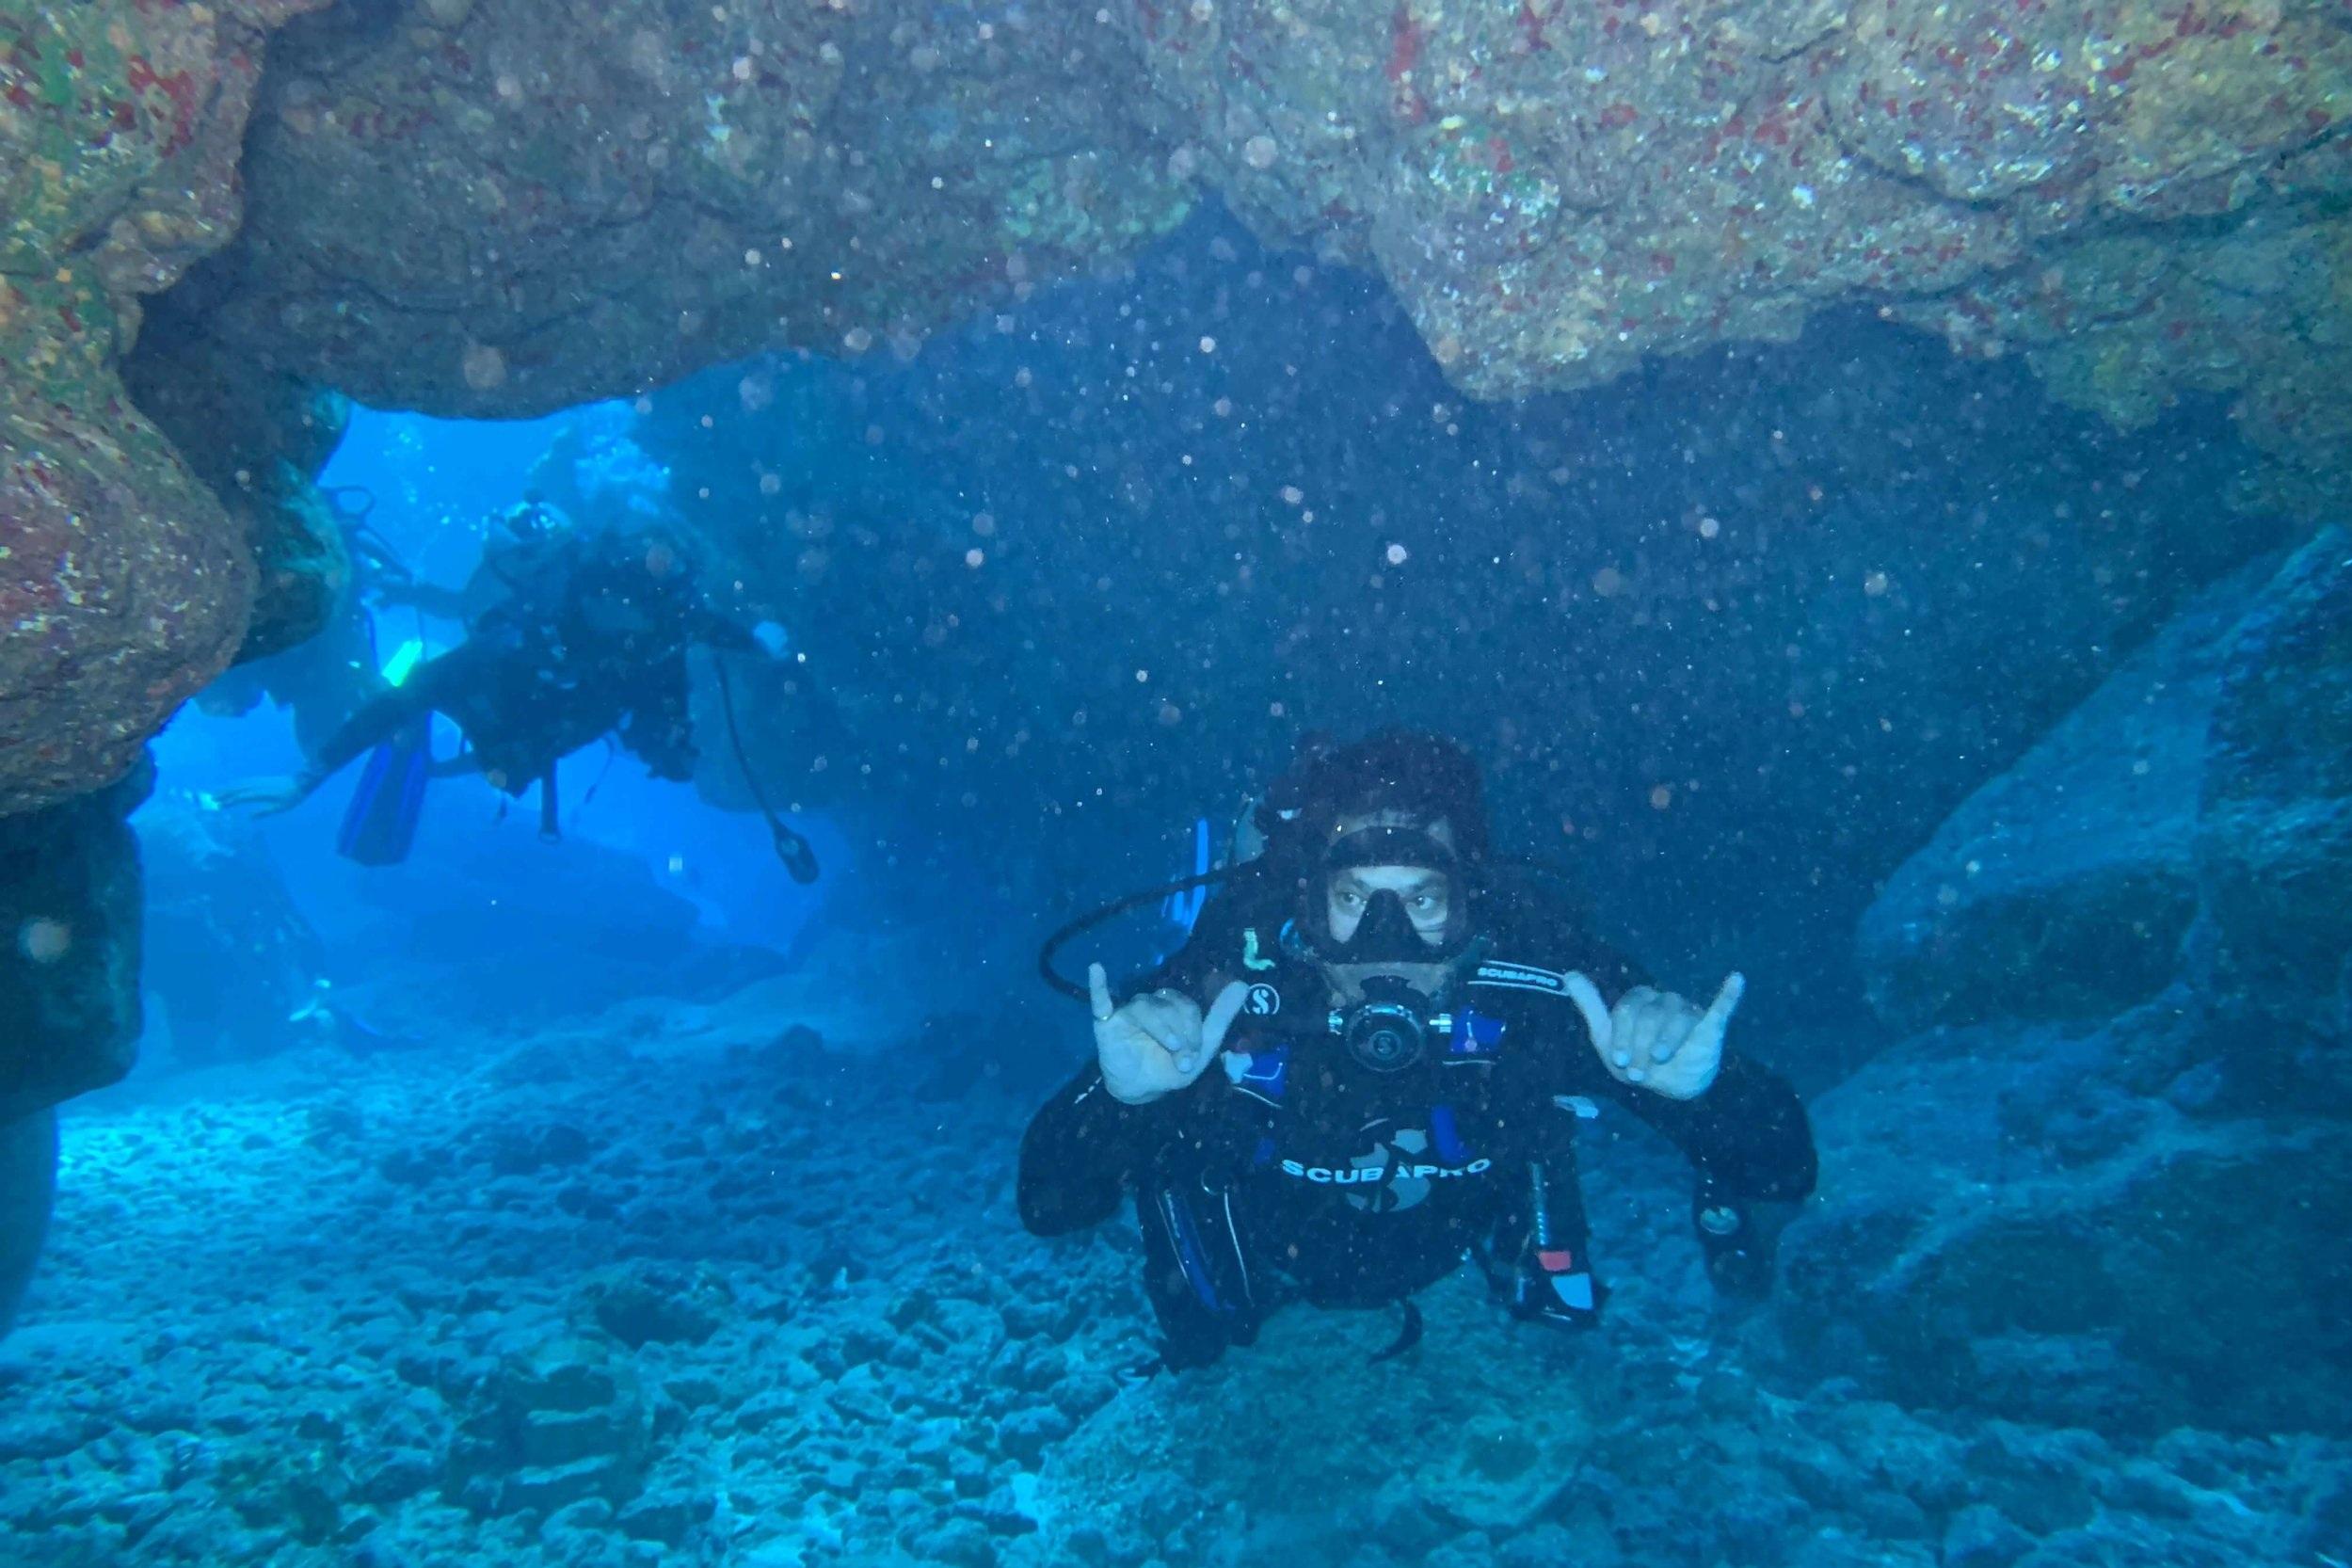 A diver swims through a spooky tunnel at Sheraton Caverns, Kauai. Photo credit: Josh Childress